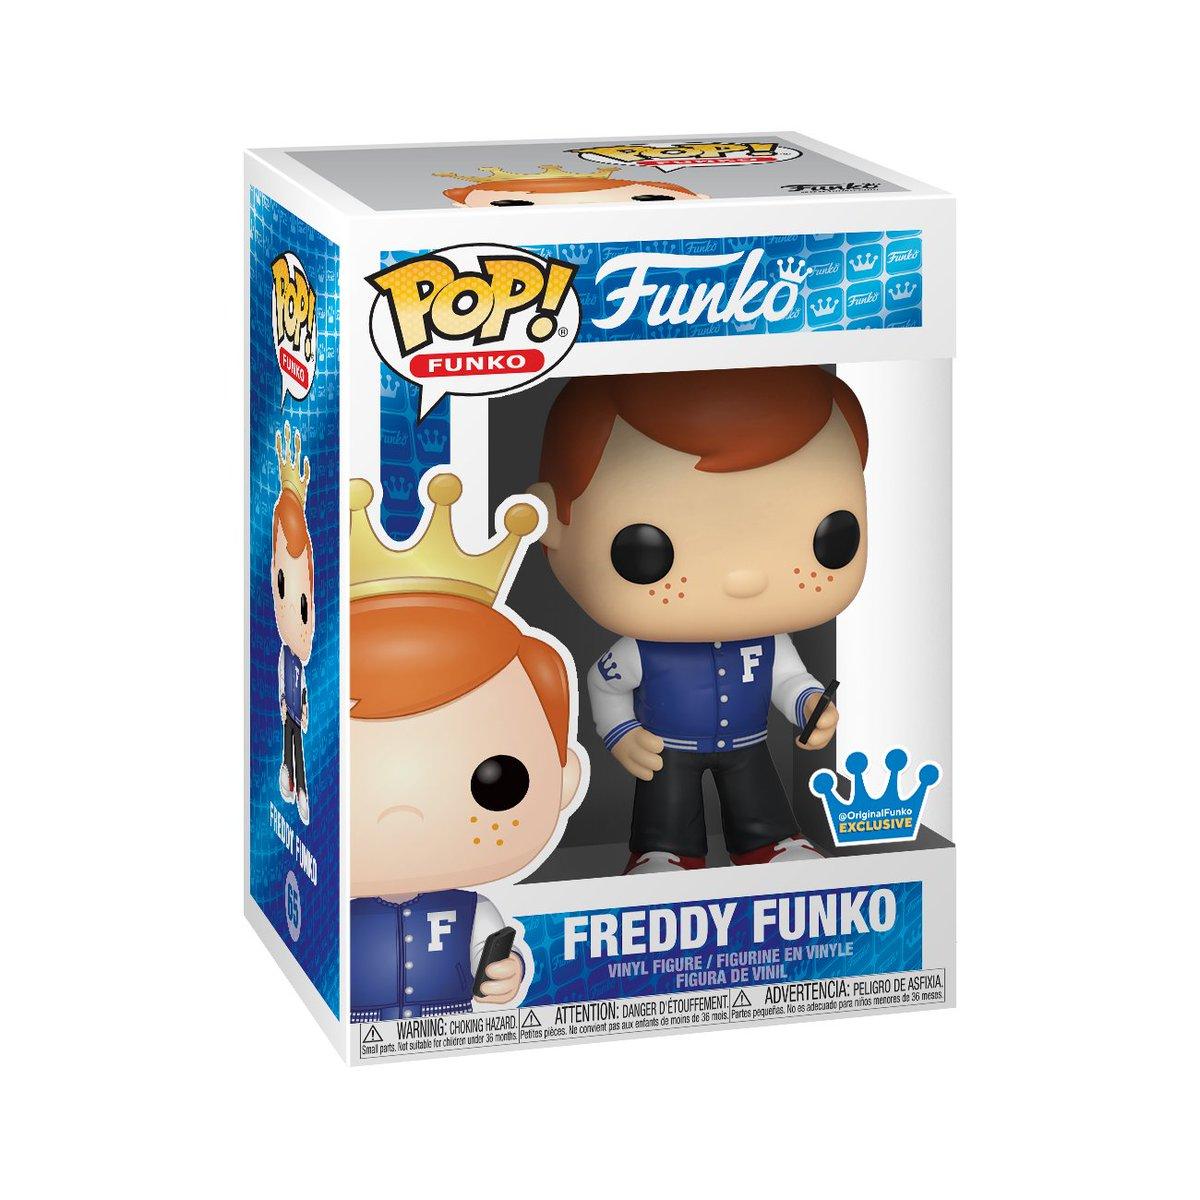 RT & follow @OriginalFunko for a chance to WIN the NEWEST version of Social Media Freddy Funko Pop!  #Funko #FreddyFunko #Giveaway #Pop #Funatics #FunkoFamily